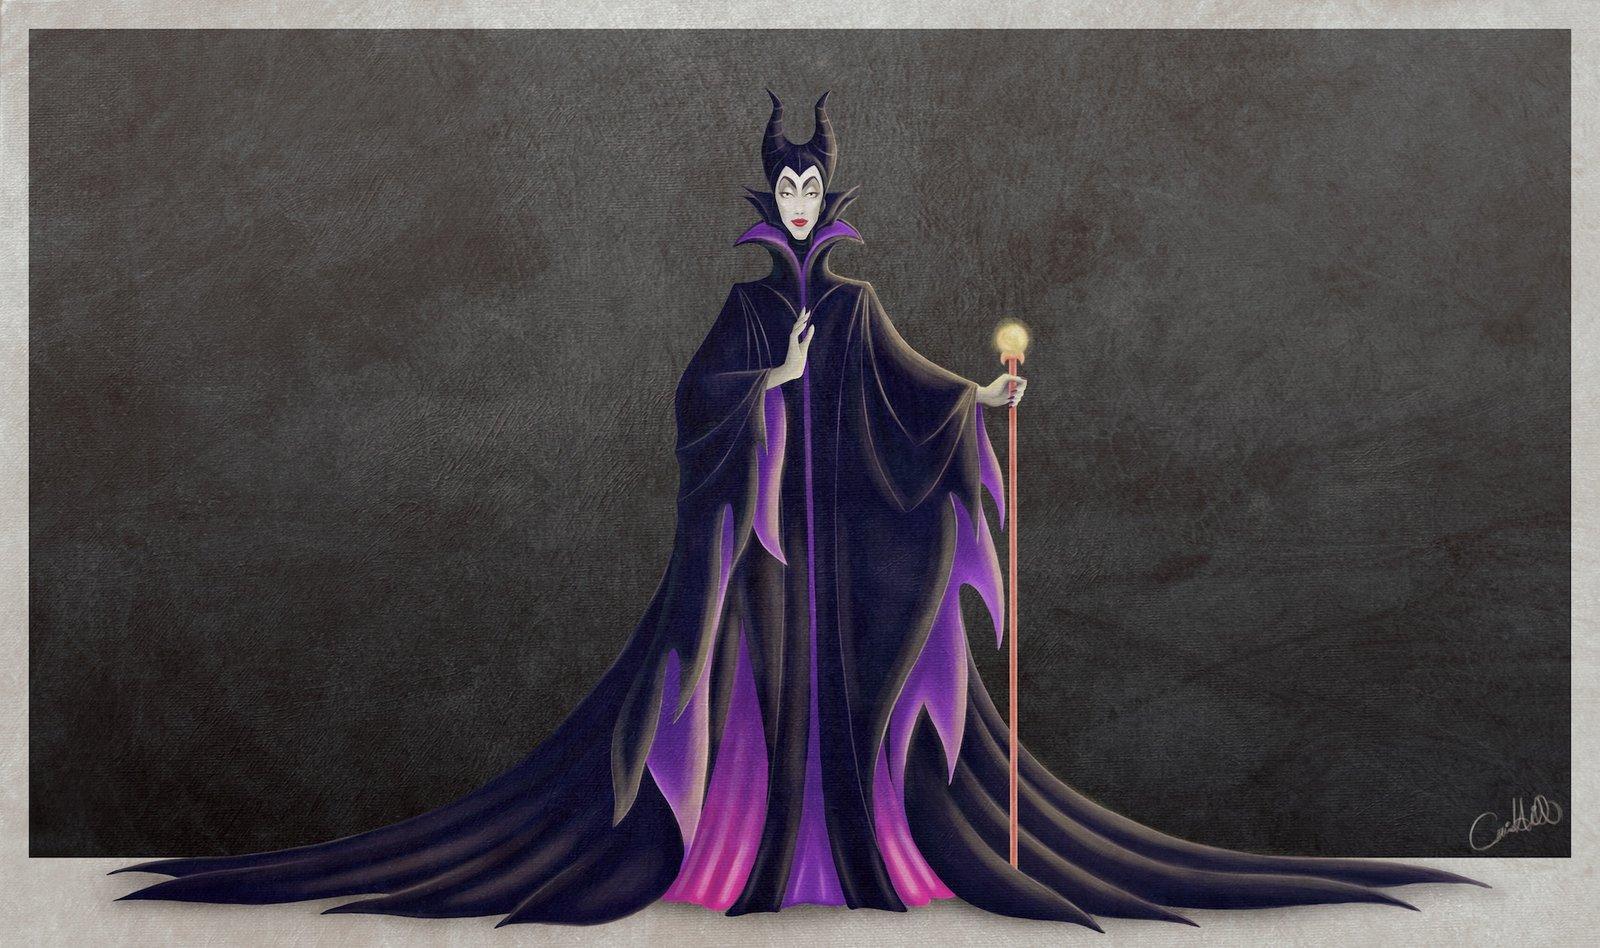 AuthorQuest: Analyzing The Disney Villains: Maleficent